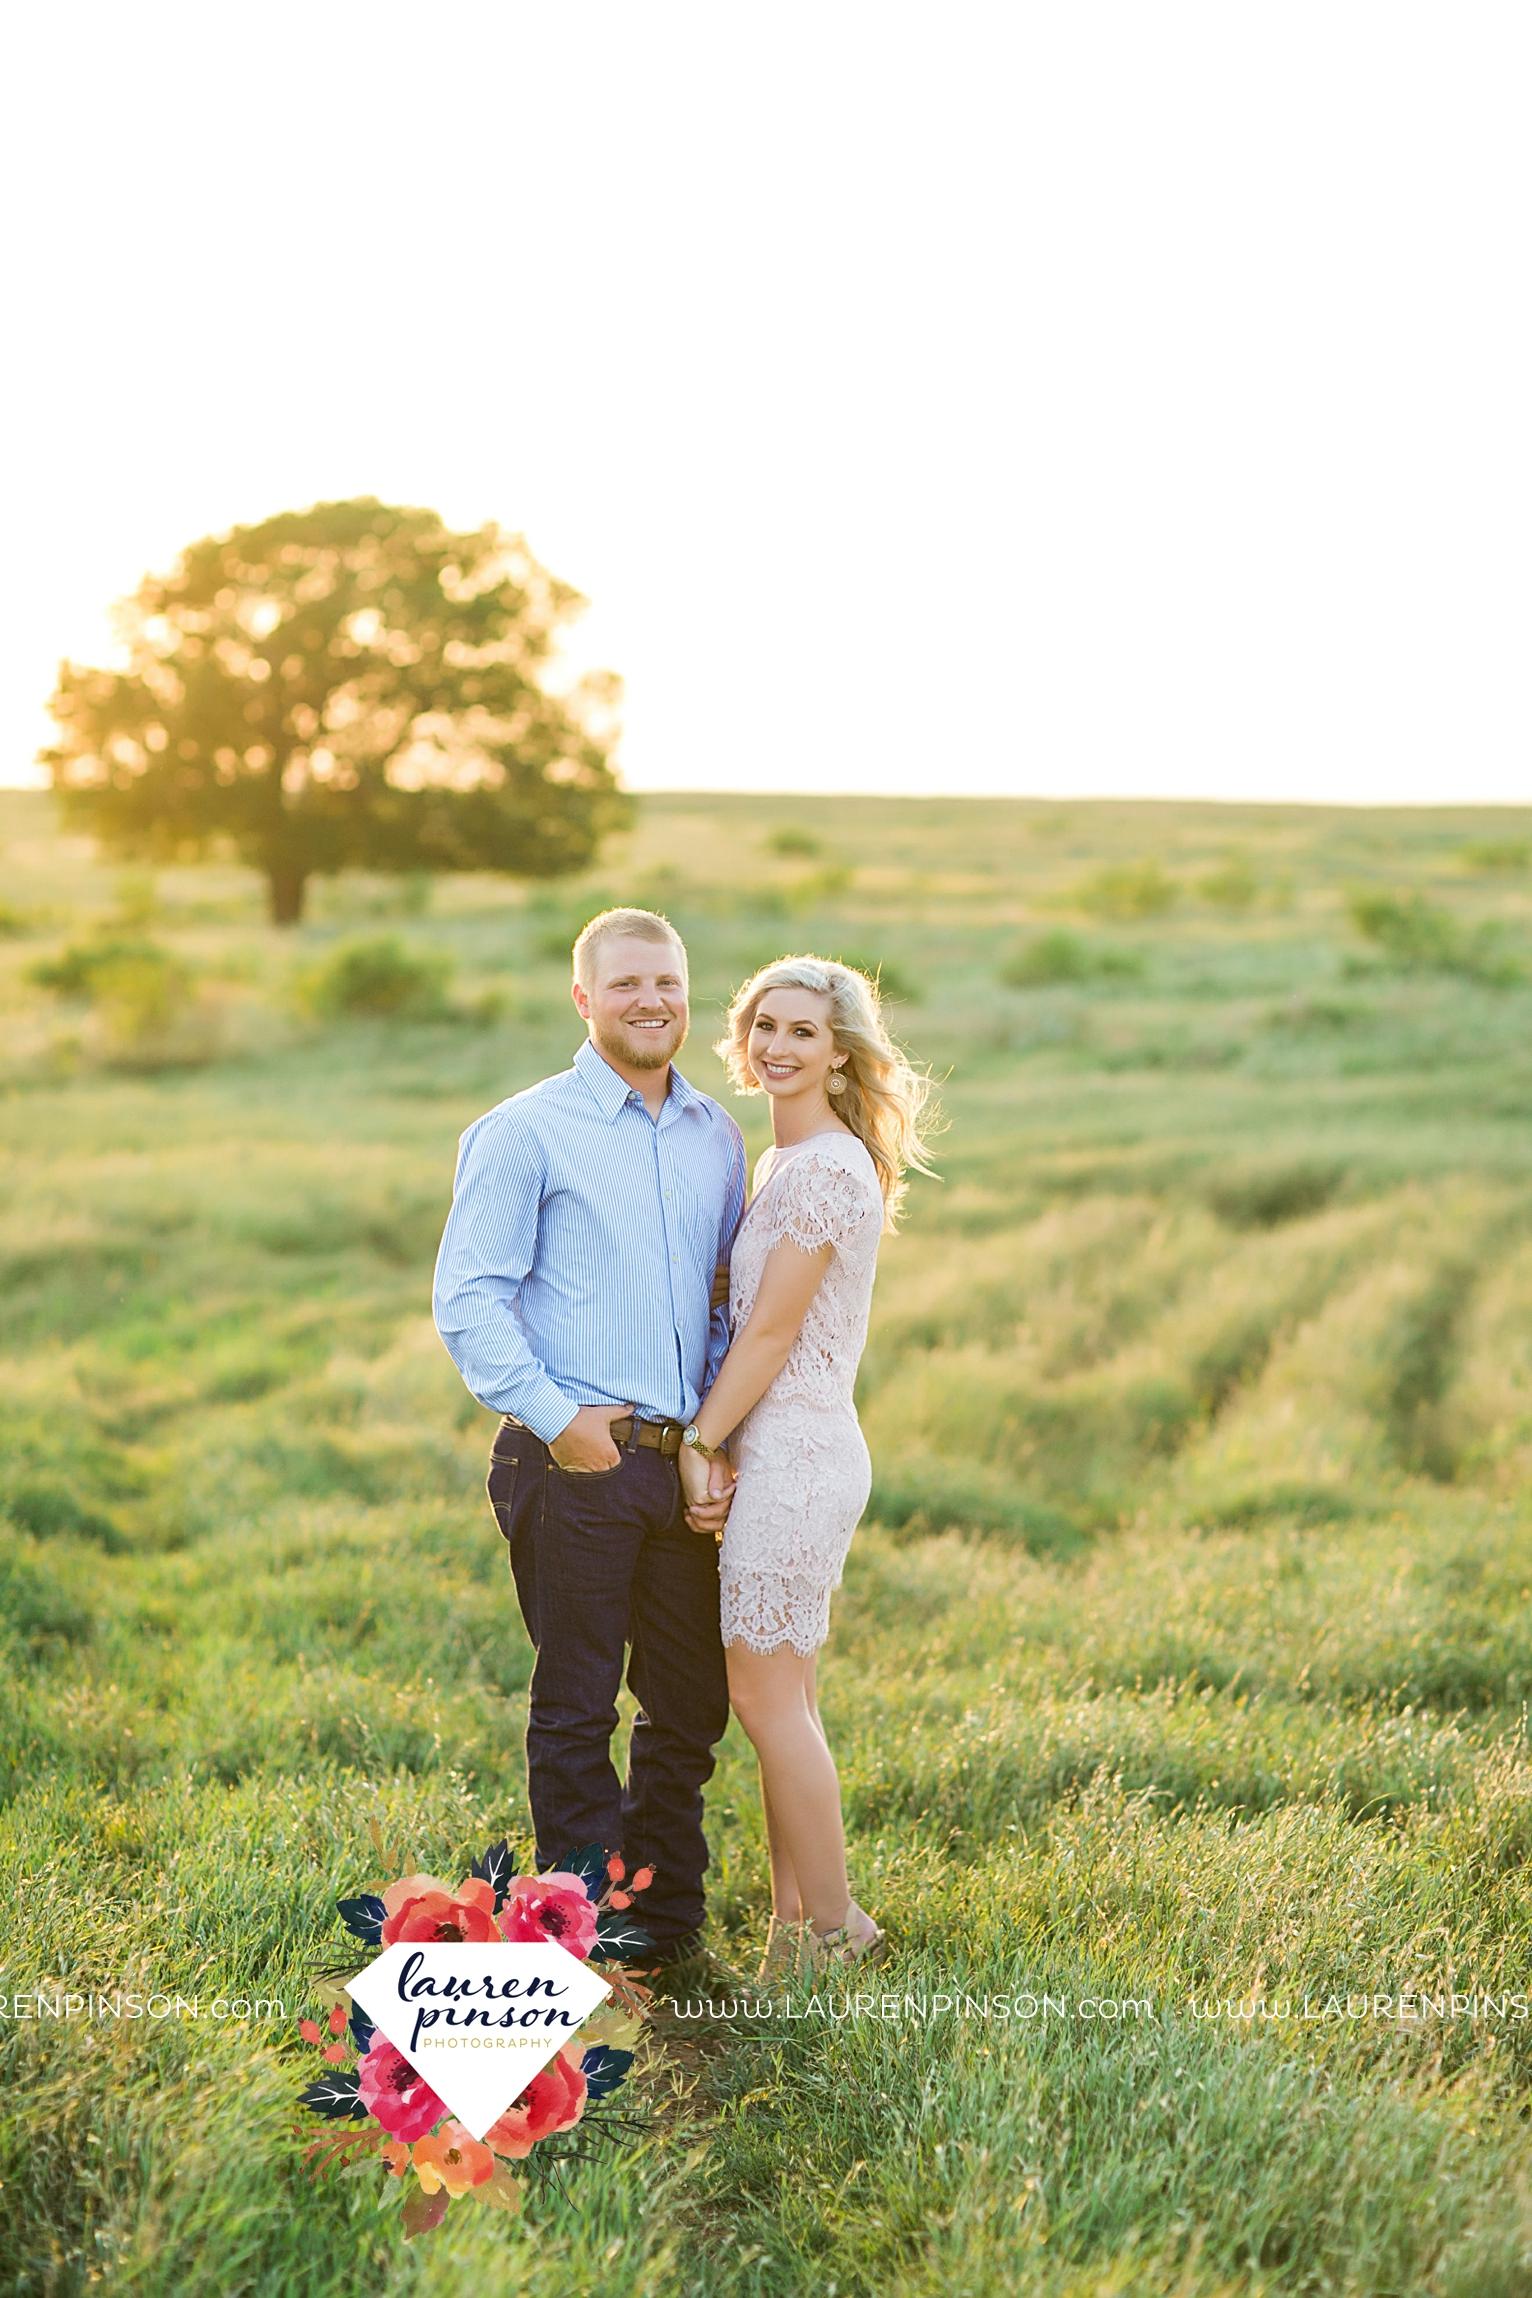 wichita-falls-texas-wedding-photographer-scotland-texas-engagement-session-country-barn-field-windthorst_2763.jpg